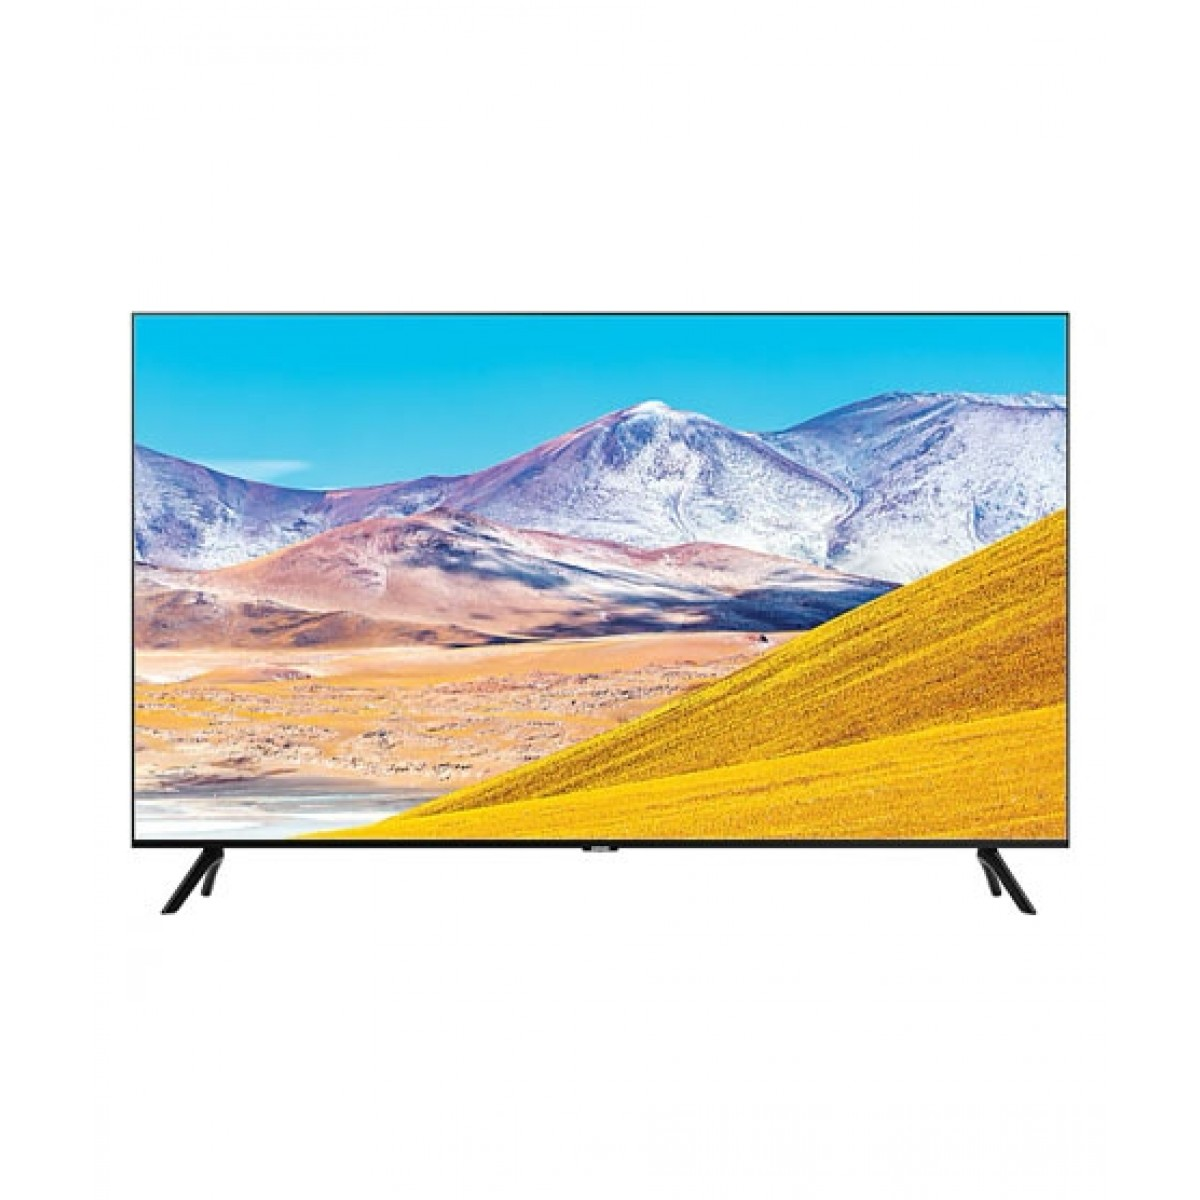 "Samsung 82"" Crystal UHD 4K Smart LED TV (82TU8000) - Official Warranty"